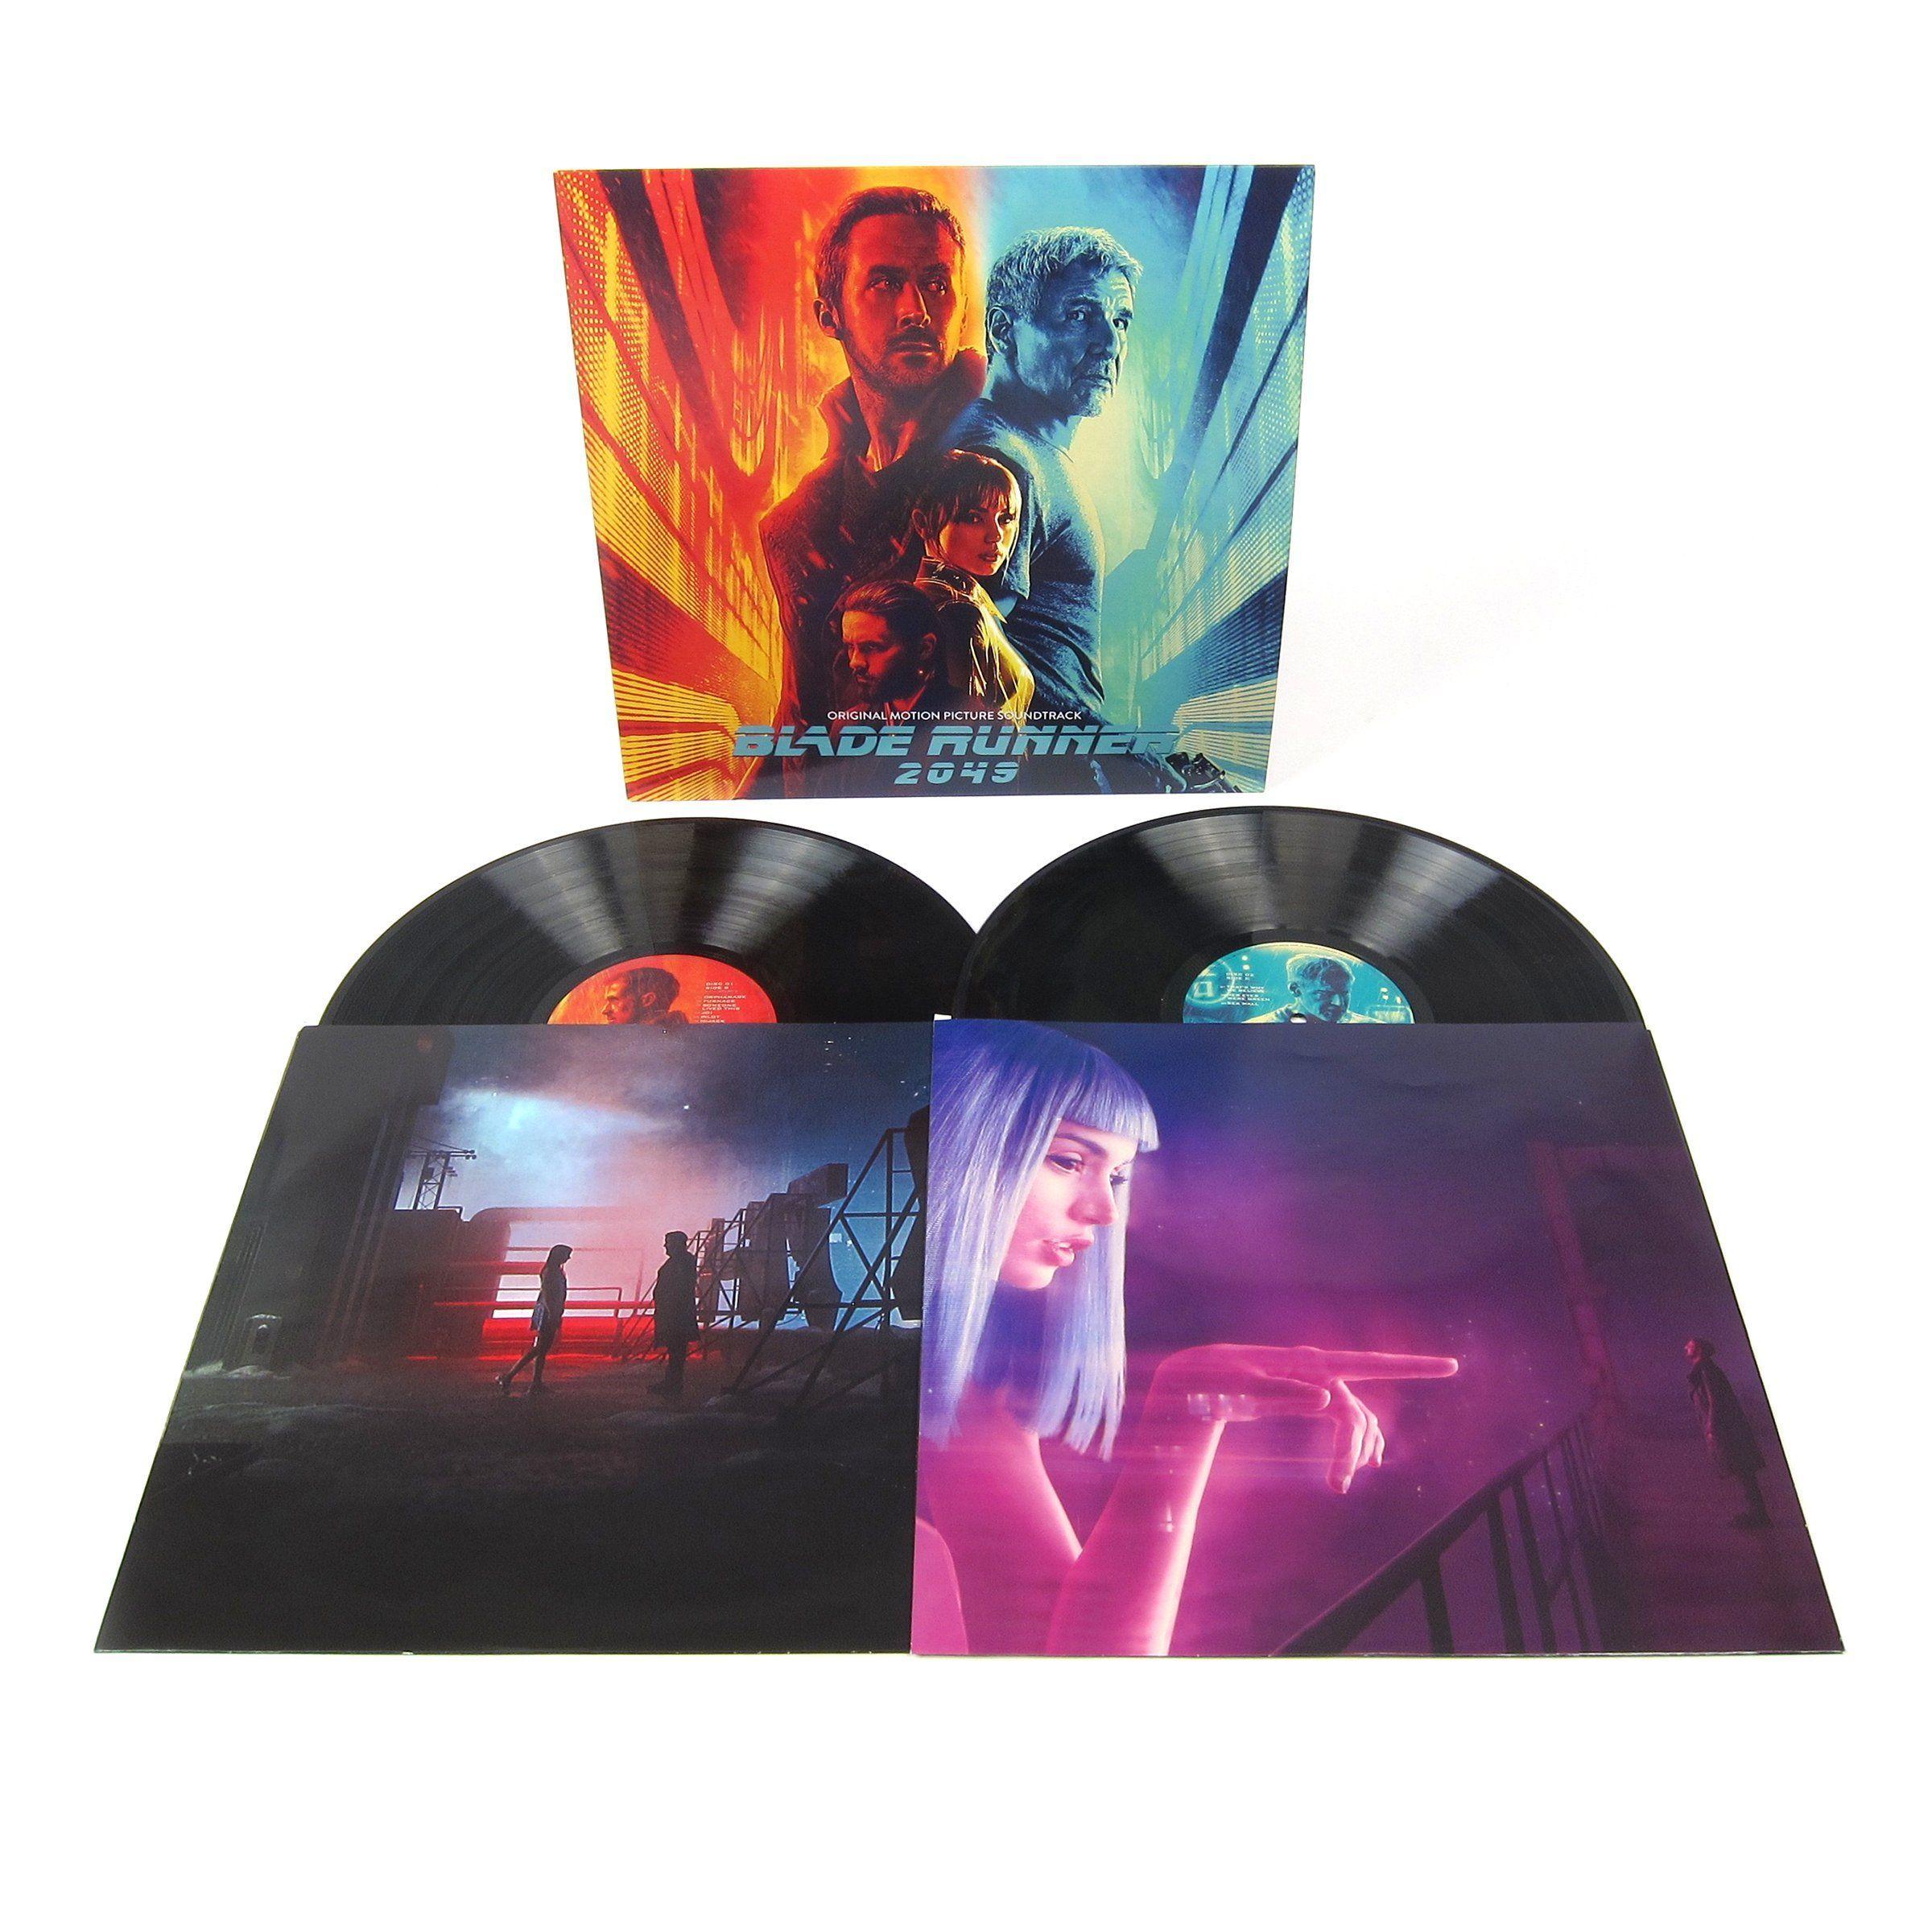 Hans Zimmer Benjamin Wallfisch Blade Runner 2049 Soundtrack Vinyl 2lp Blade Runner Blade Runner 2049 Soundtrack Blade Runner 2049